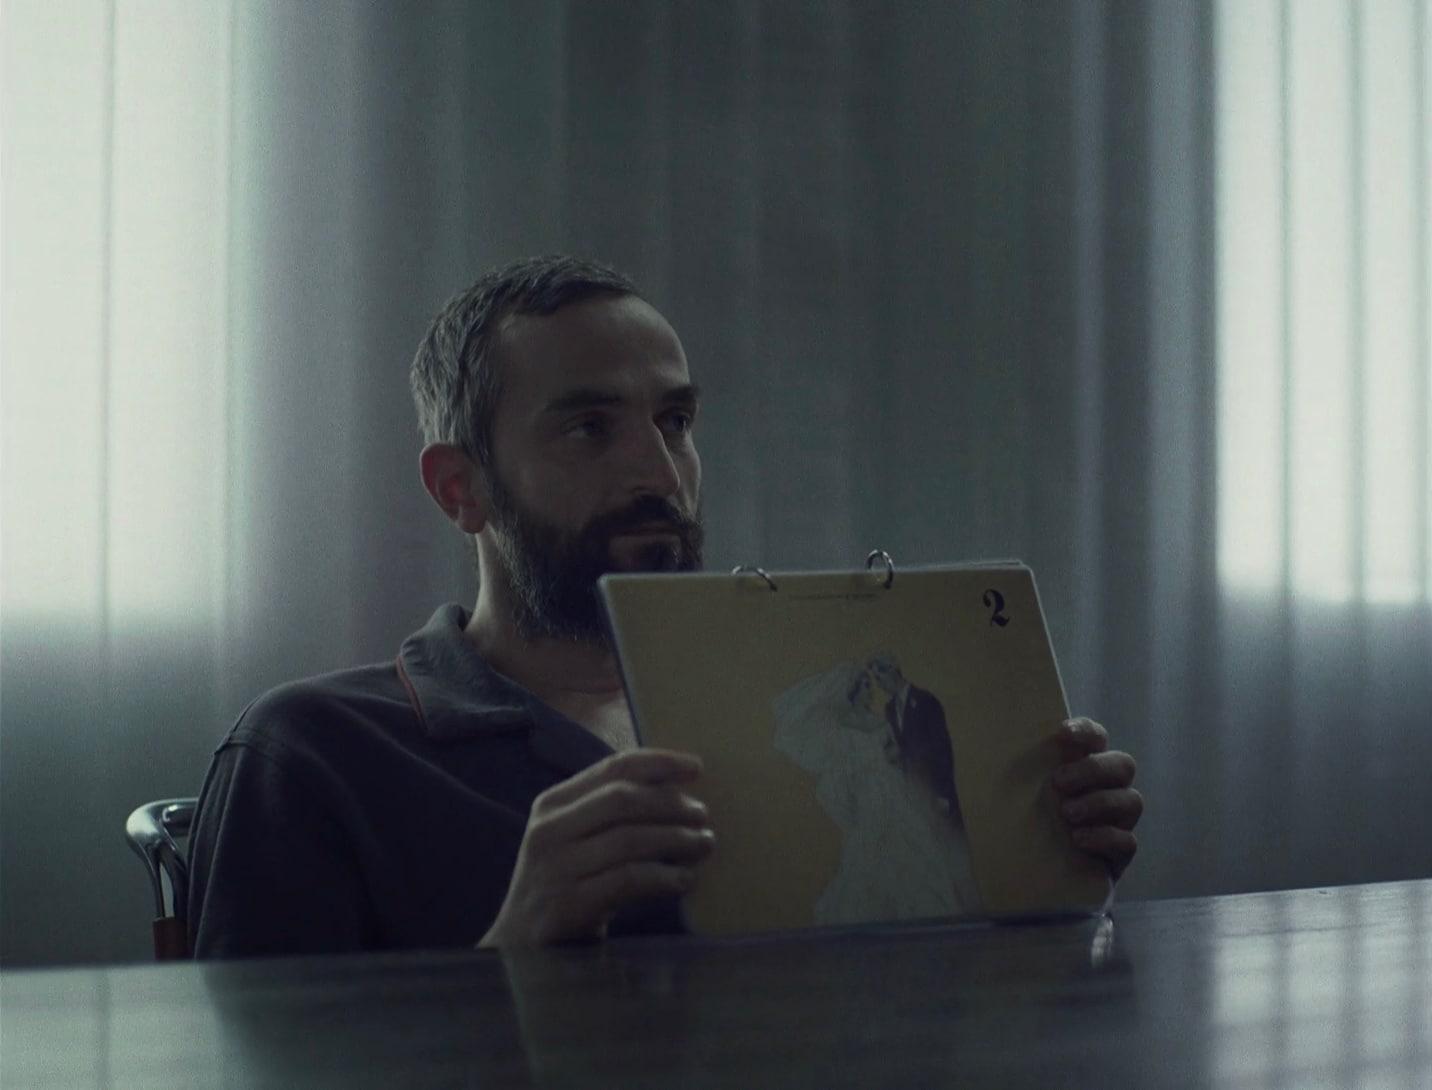 Aris Servetalis